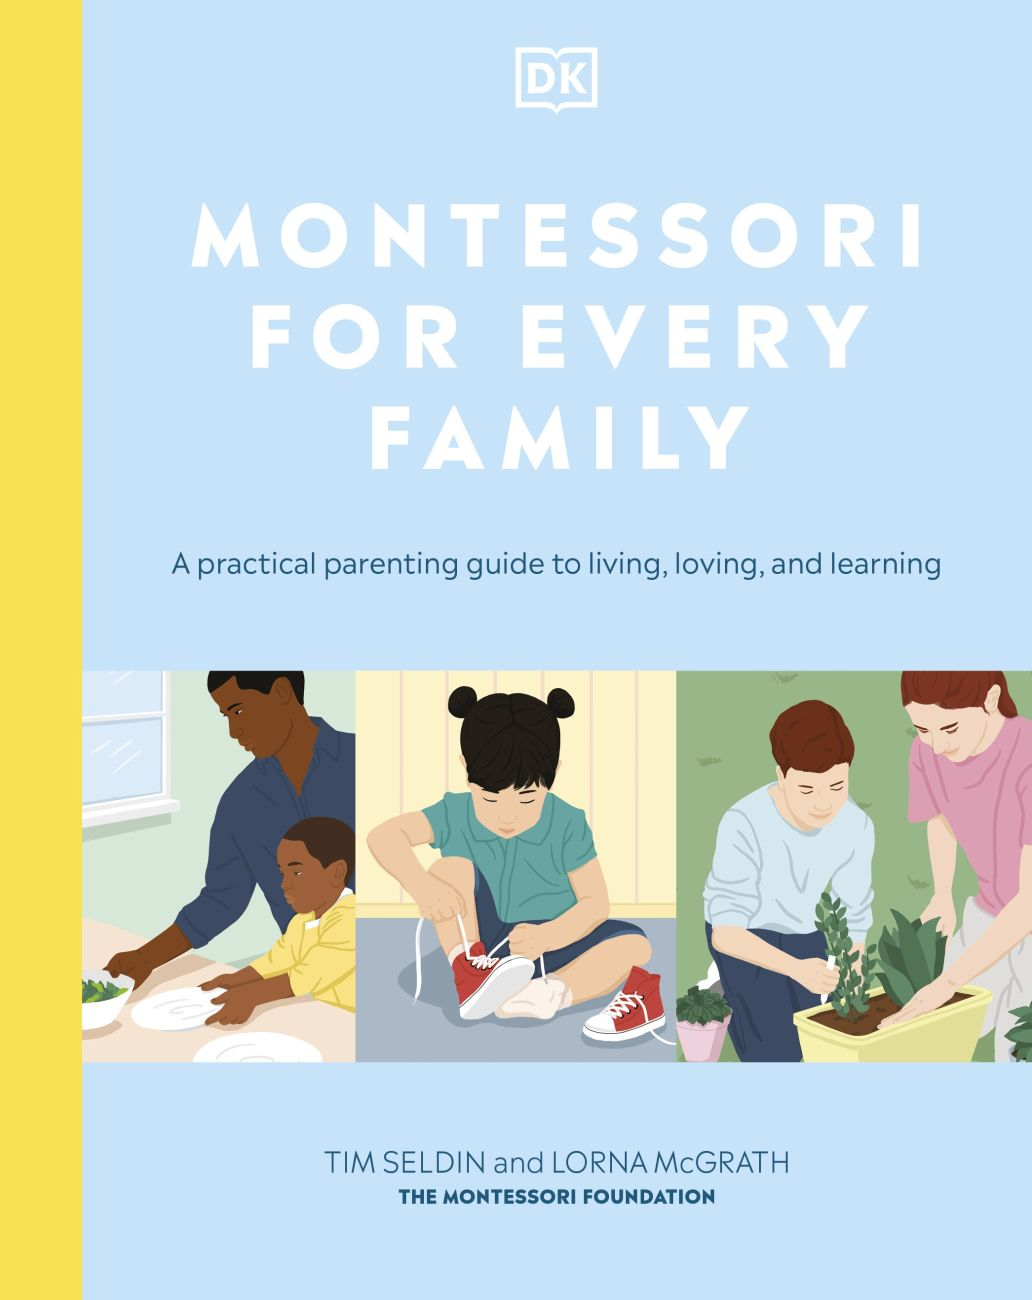 Montessori For Every Family by Tim Seldin, Lorna McGrath |